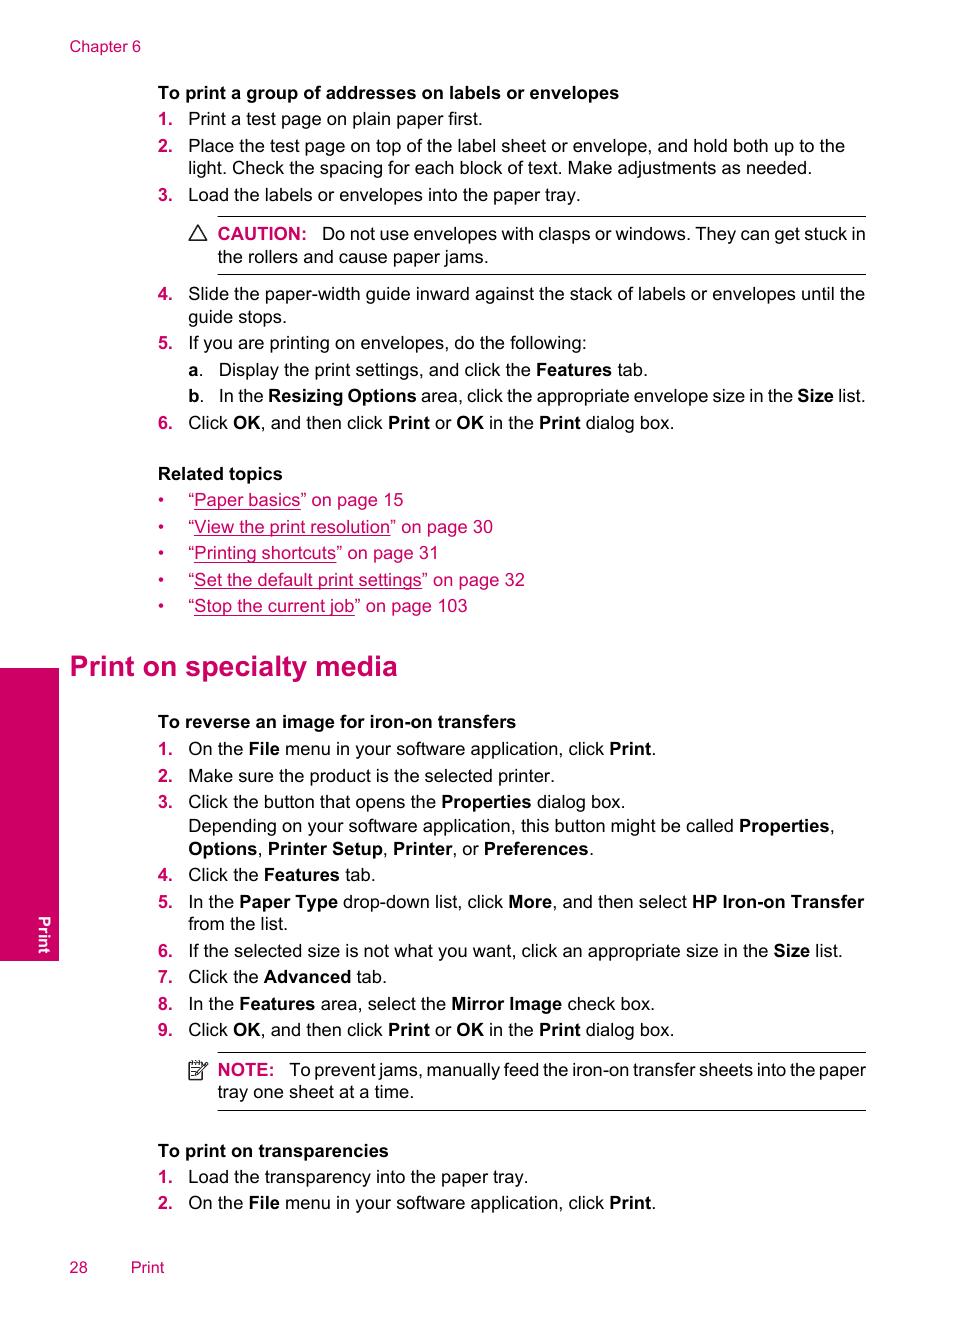 Print on specialty media | HP Photosmart C4780 User Manual